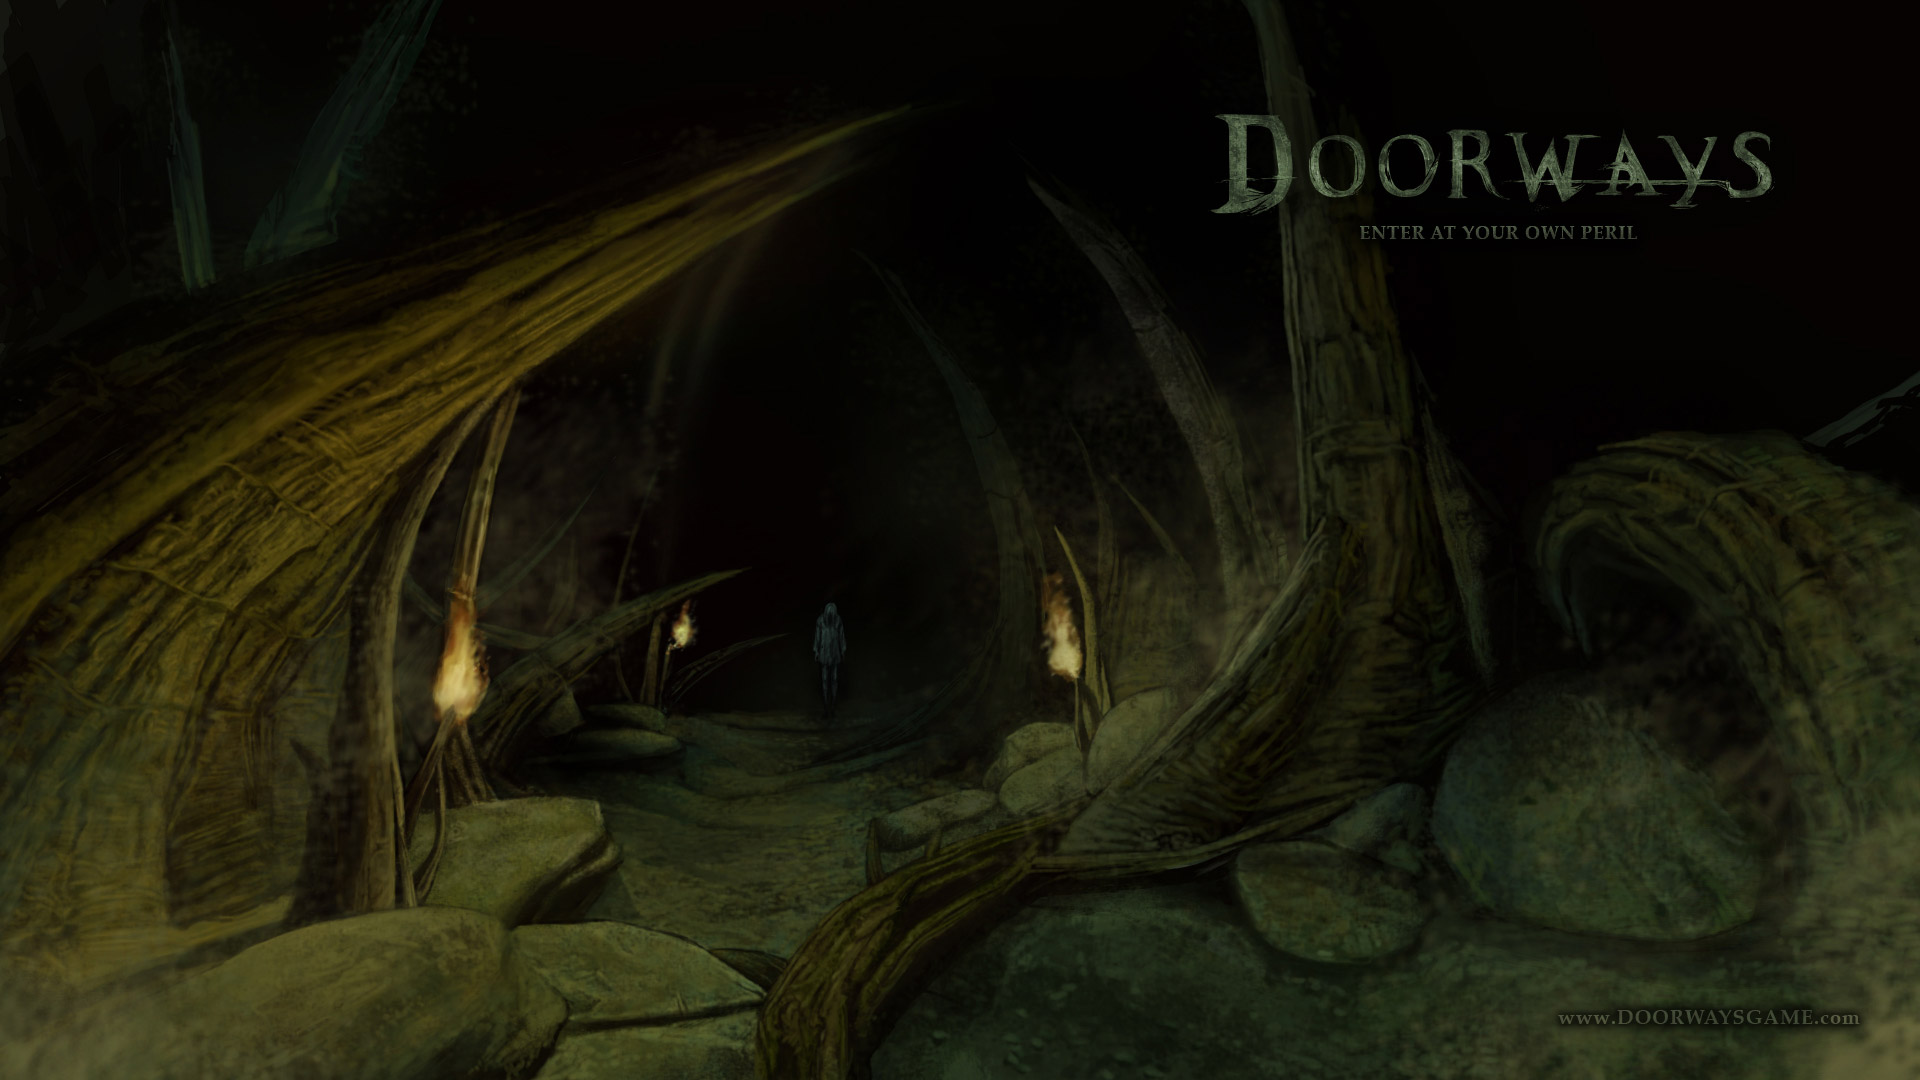 Free Doorways: The Underworld Wallpaper in 1920x1080